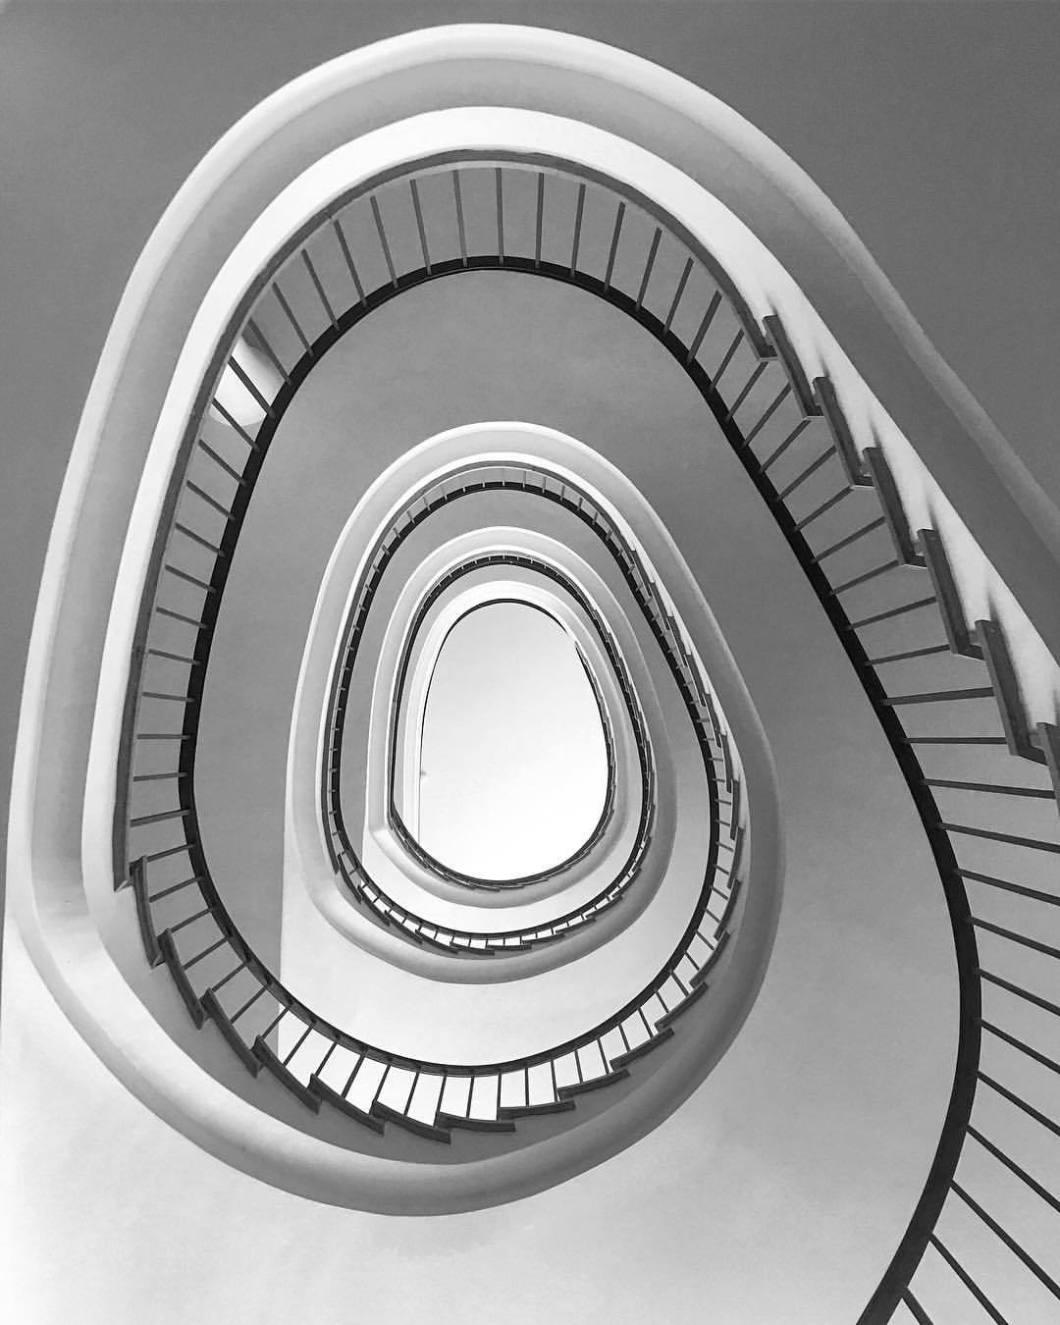 Stairway, Bielefeld 218..#photooftheday #onephotoaday #photography #photographerslife #iphoneonly #iphonography #iphonephotography #iphone6s #colorphotography #architecture #architektur #architekturfotografie #architecturephotography #reportagefotografie #streetlife #streetart #streetstyle #streetphotography #bielefeld #owl #teutoburgerwald #blackandwhite #blackandwhitephotography #monochrome #treppe #stairway #lookabove (hier: Bielefeld, Germany)